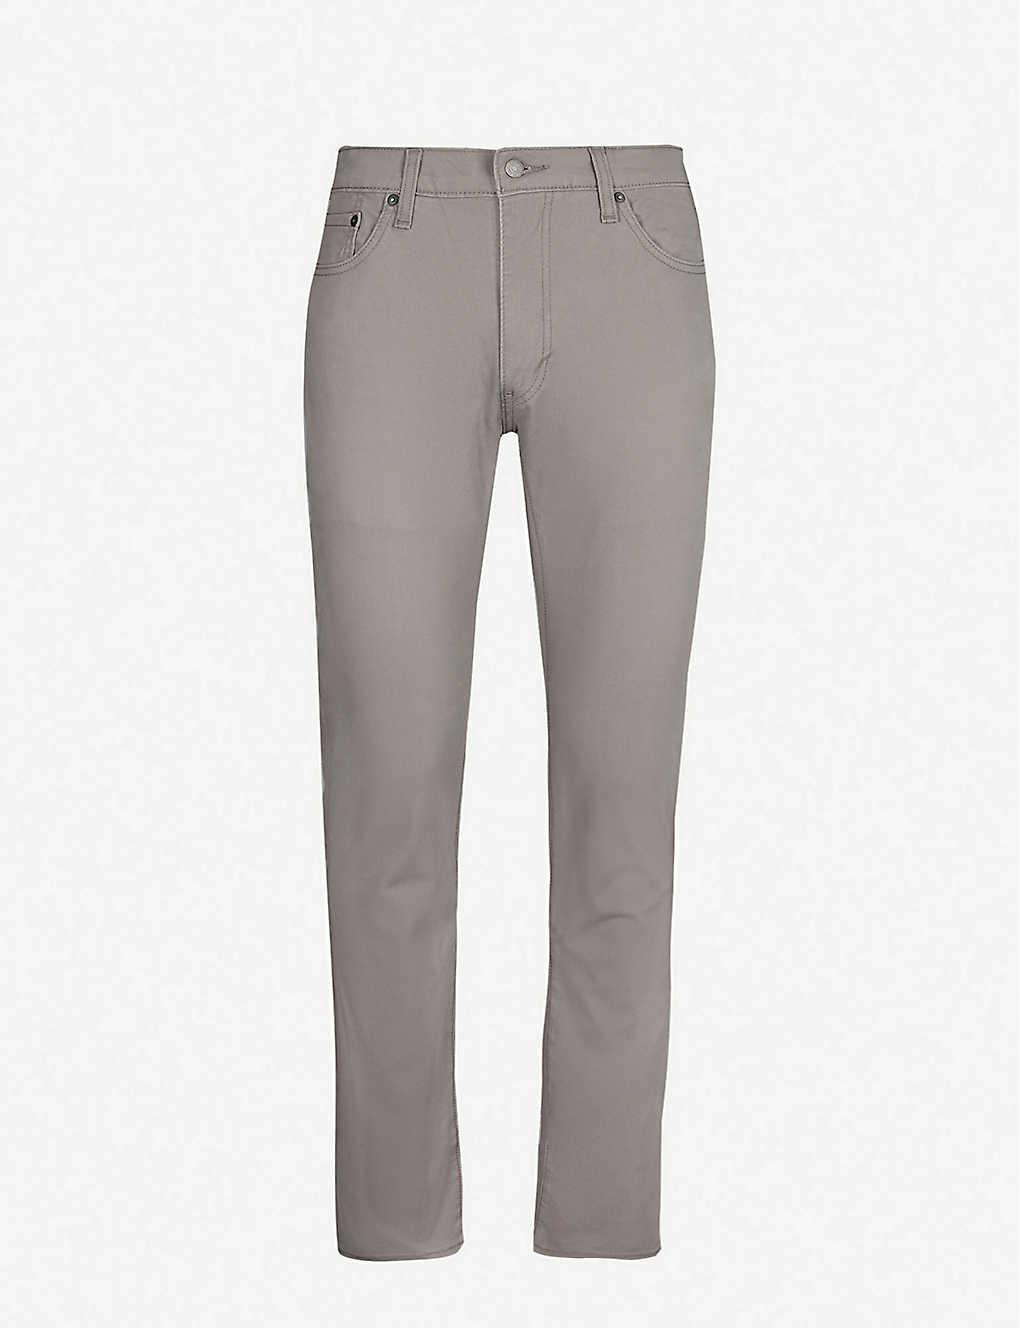 842851aee5c LEVIS - 511 slim-fit tapered jeans | Selfridges.com